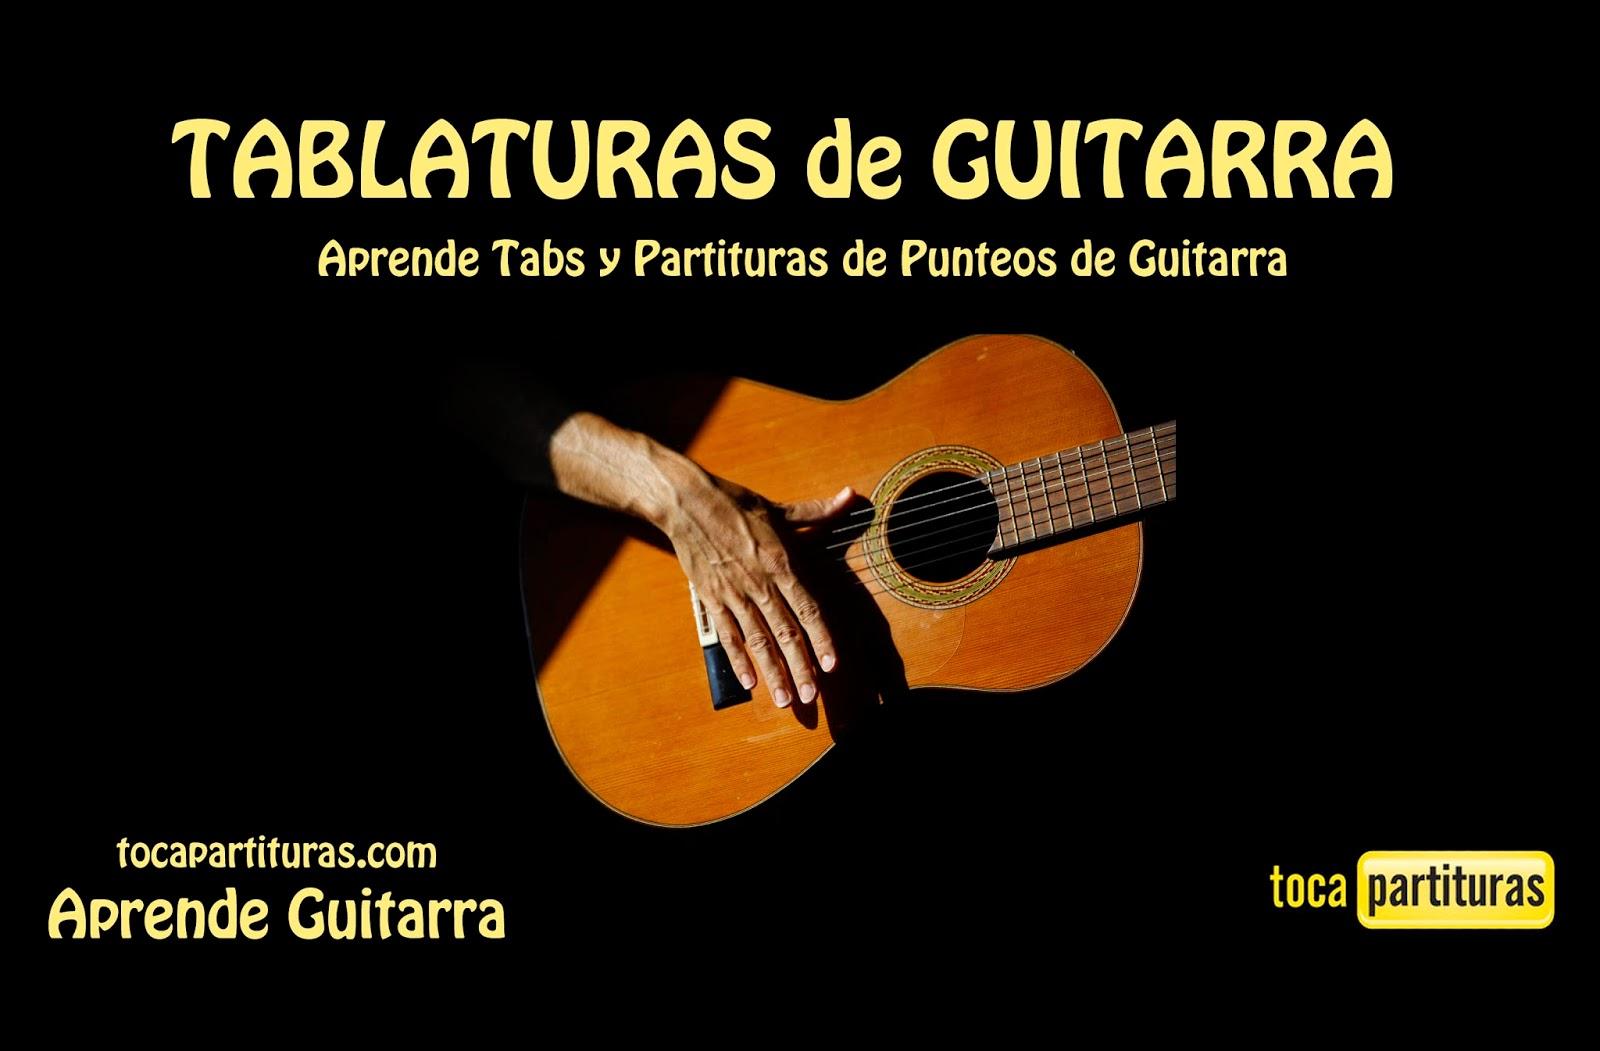 Oh When the Saints Partitura Dúo de Guitarras Popular en Estados Unidos Sheet Music for two guitars